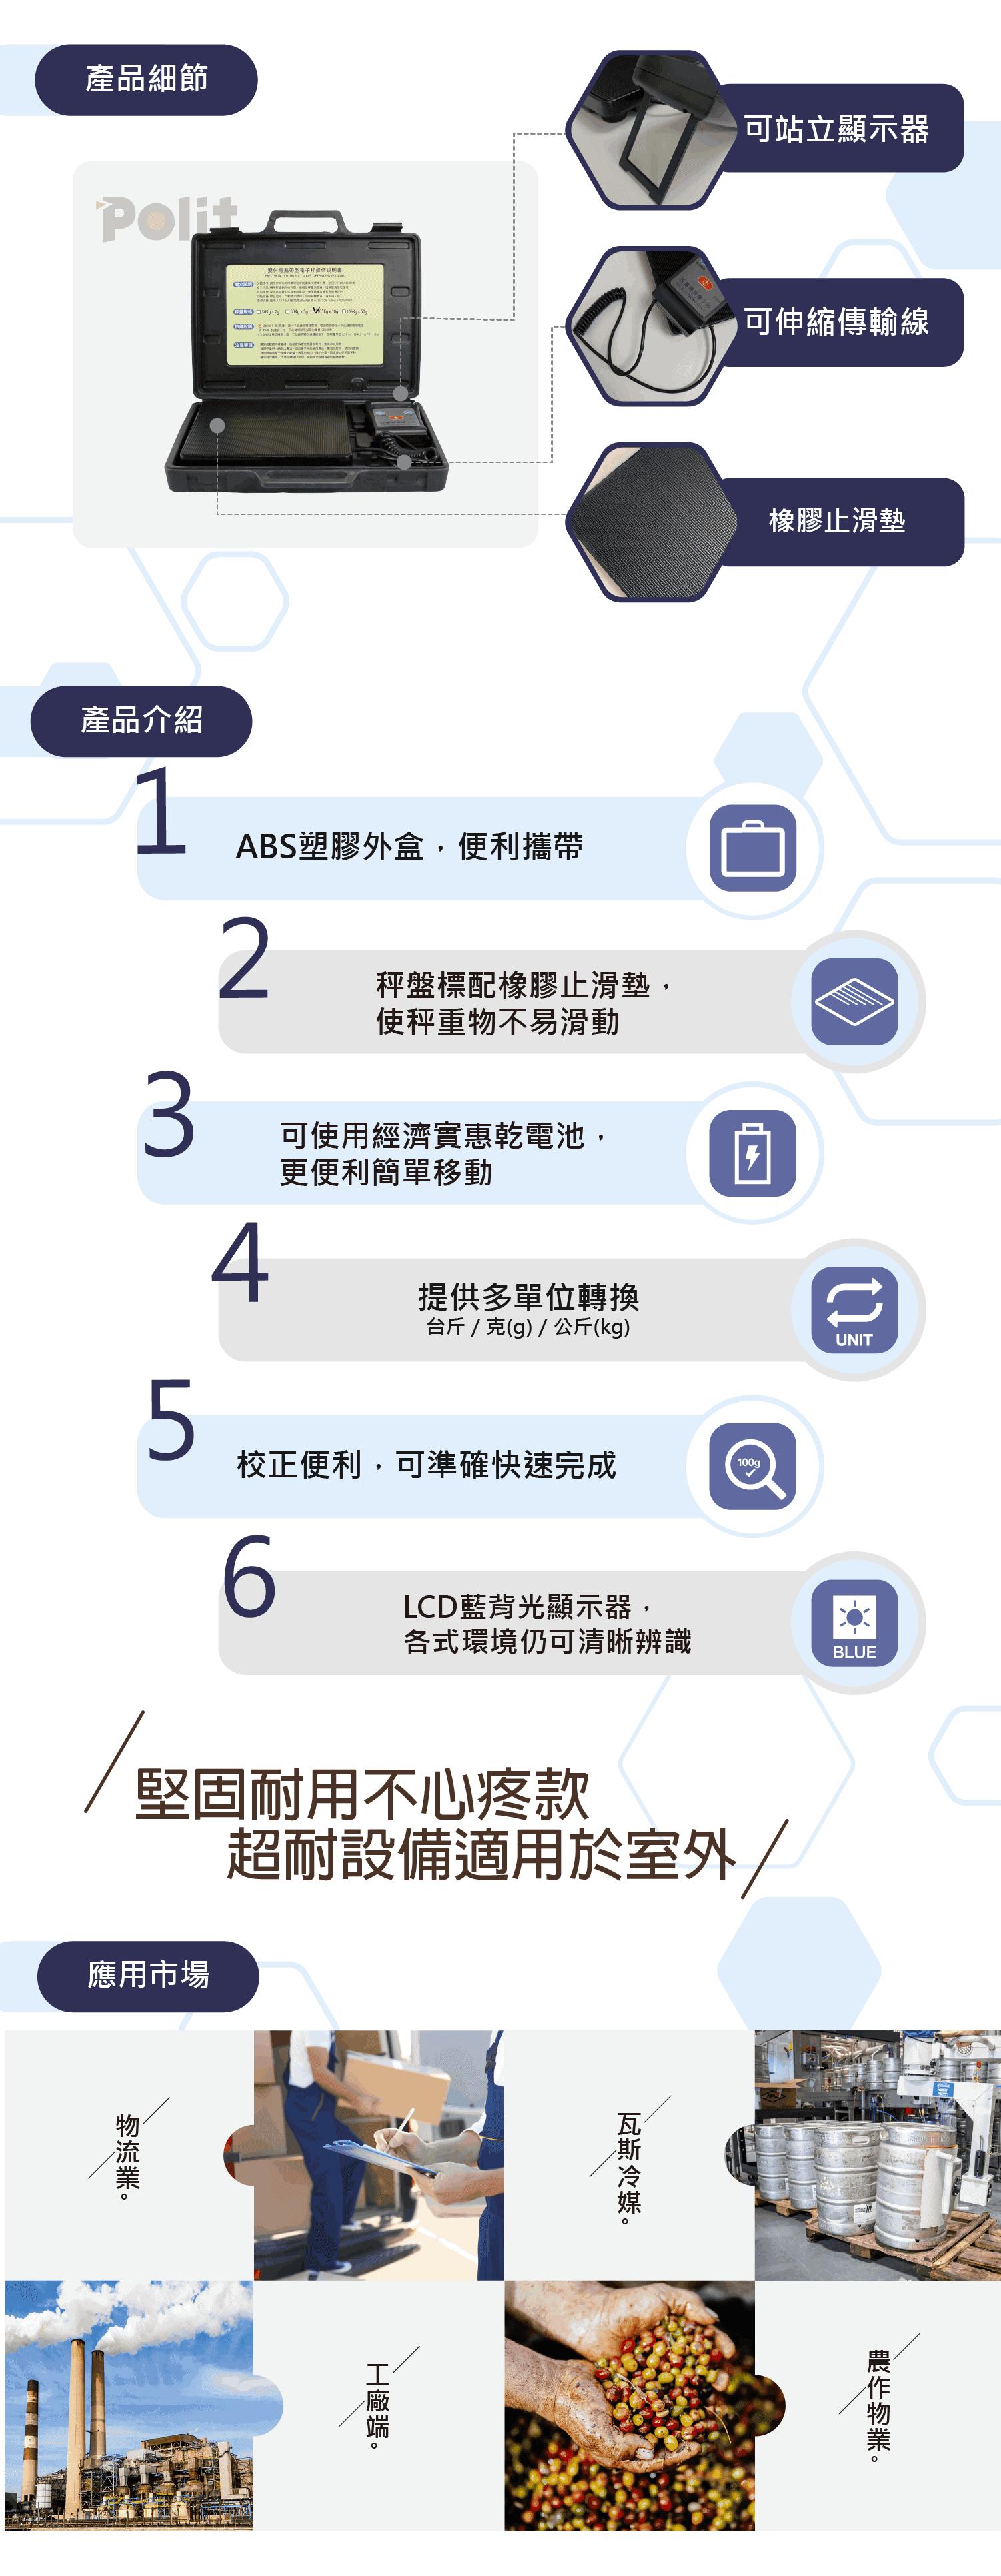 HBS 攜帶型電子秤 產品介紹 | 沛禮國際 Polit 電子秤專賣